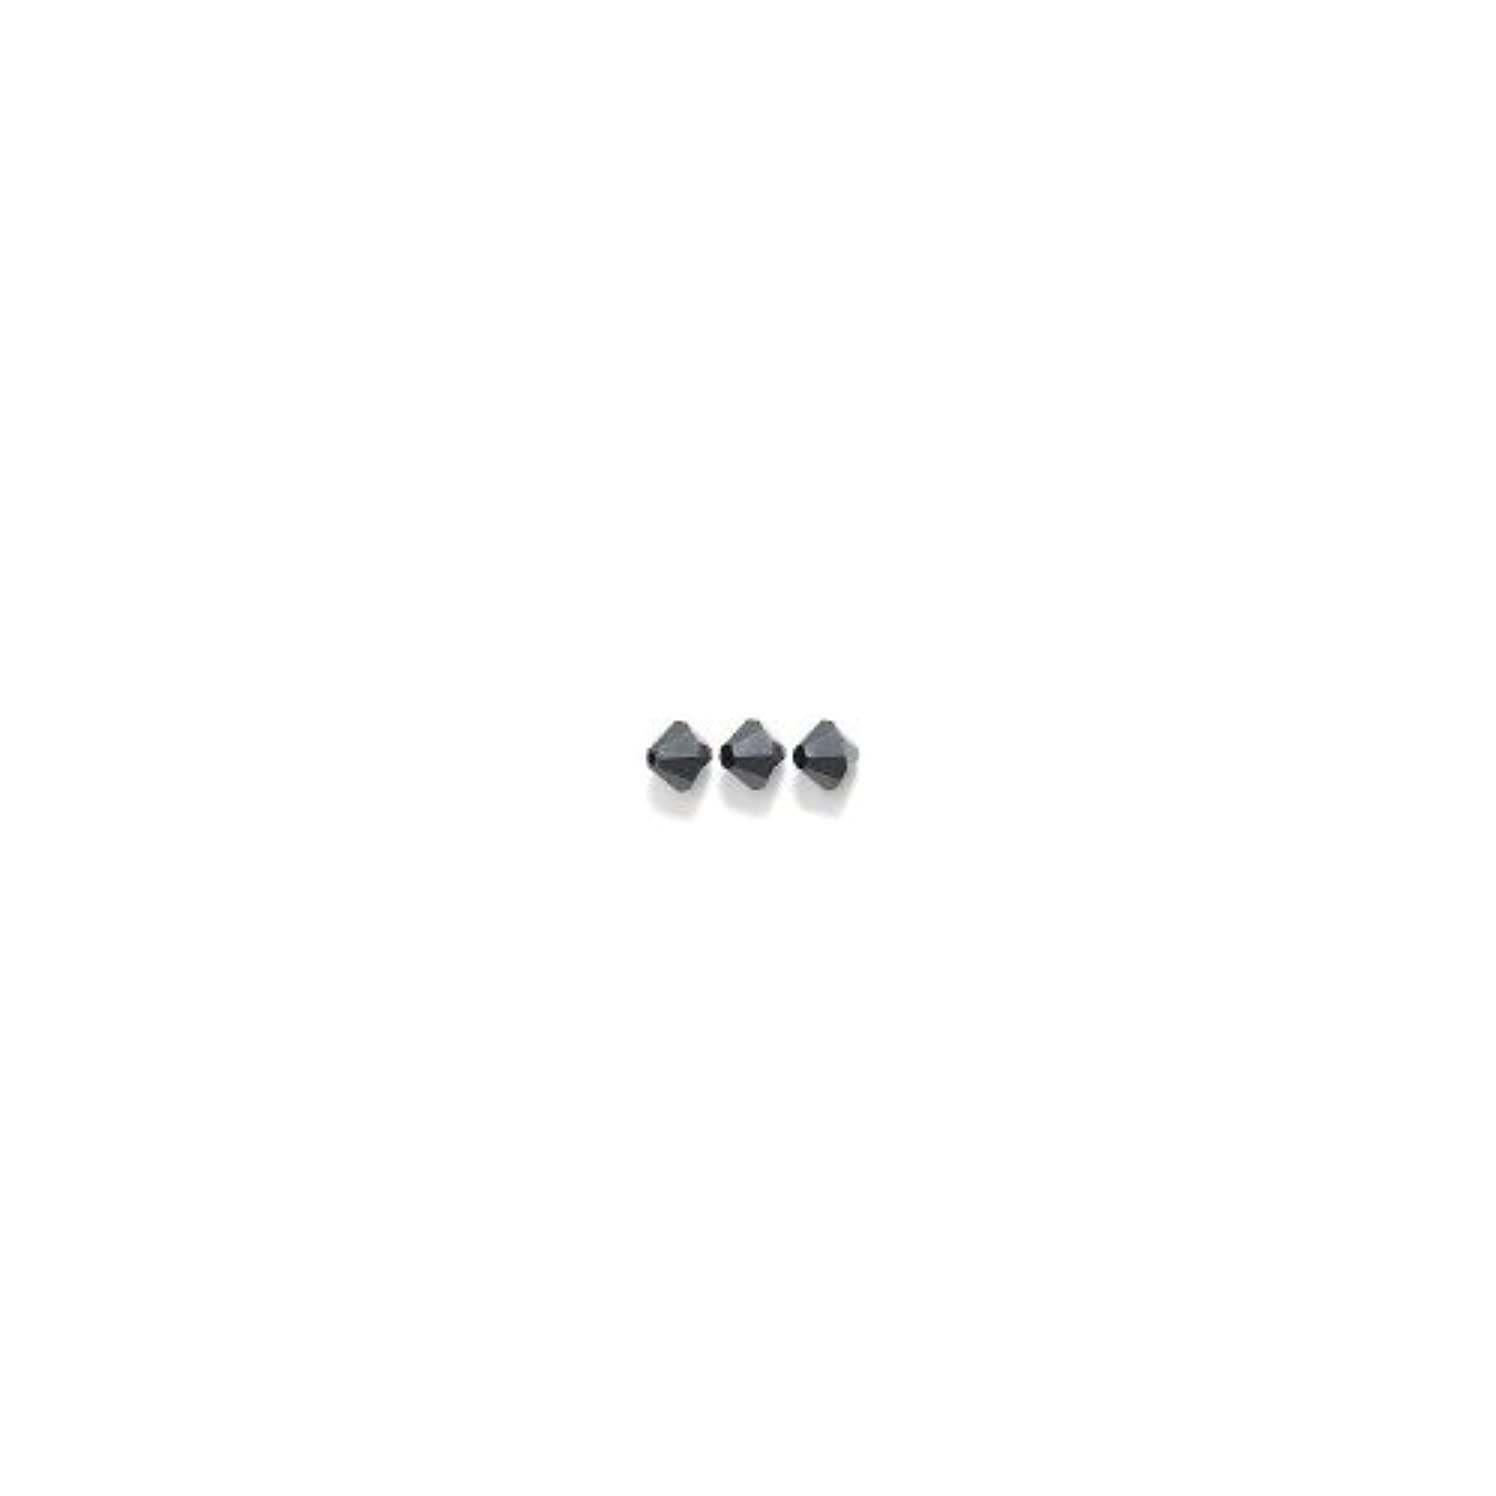 Swarovski 5328 Xilion Bicone Diamond Beads, Opaque, Jet, 6-mm, 24/Pack